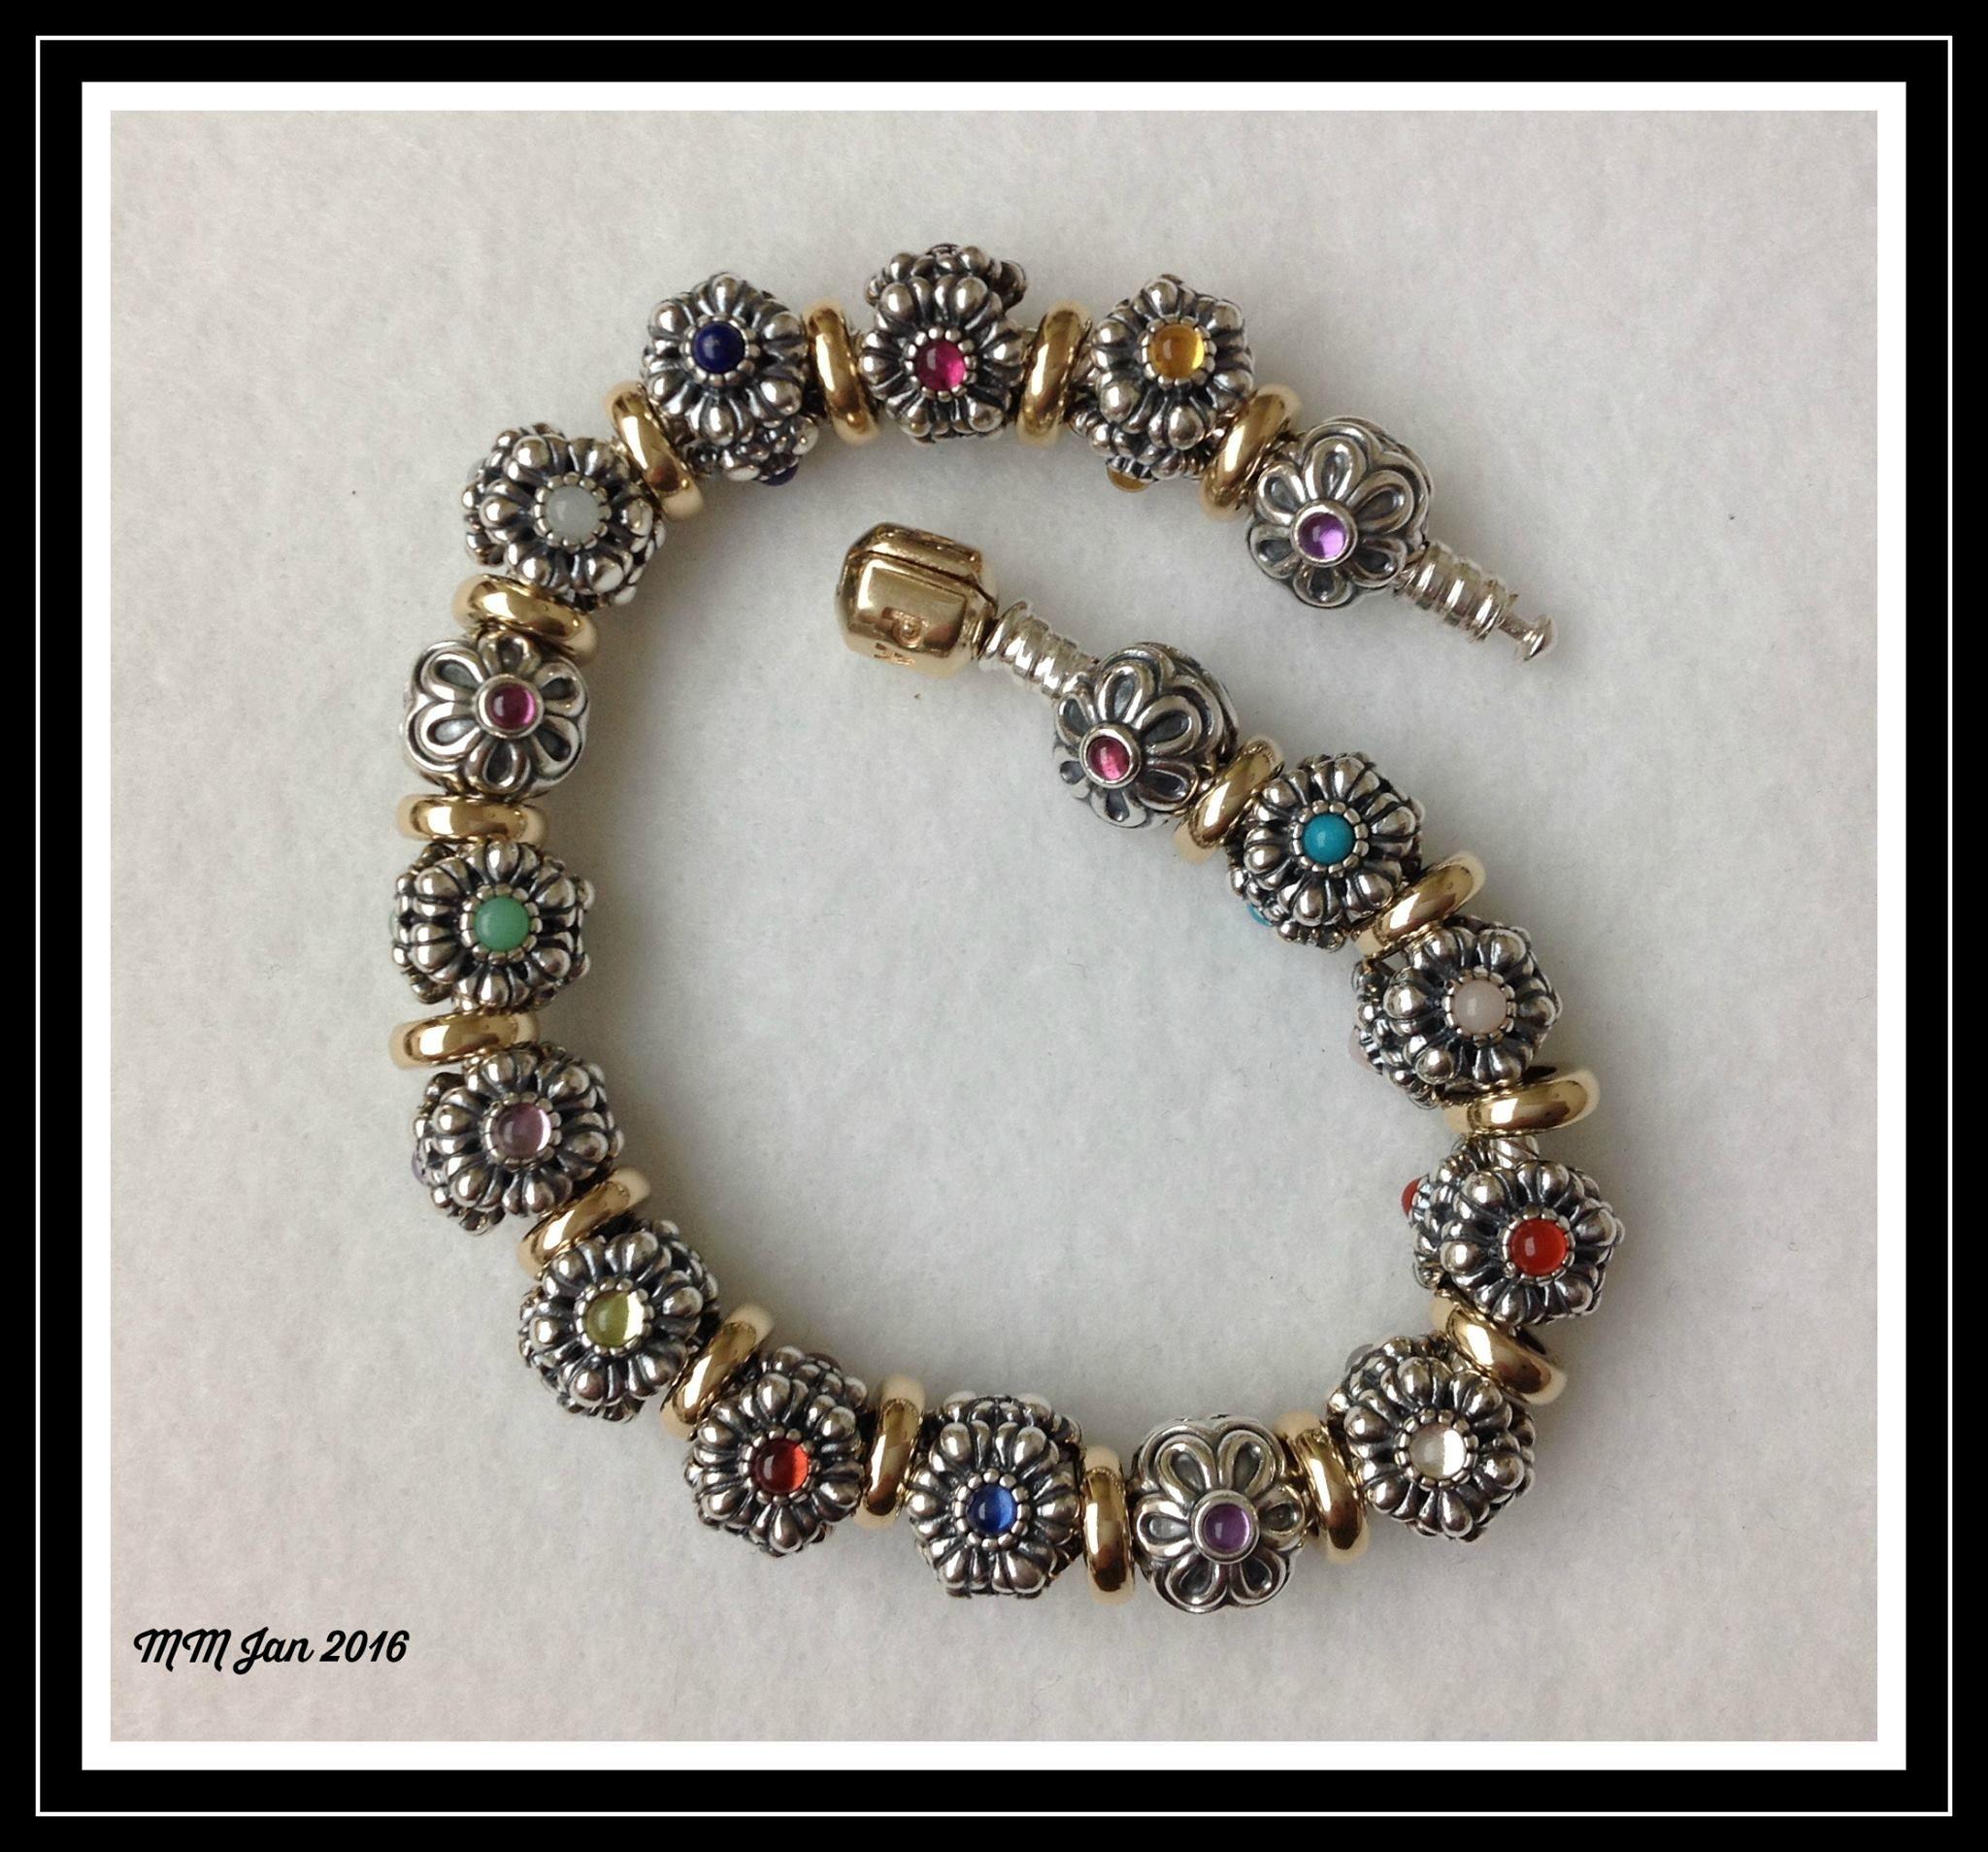 Birthday Bloom Bracelet Pandora Bracelet Charms Pandora Bracelets Pandora Jewelry